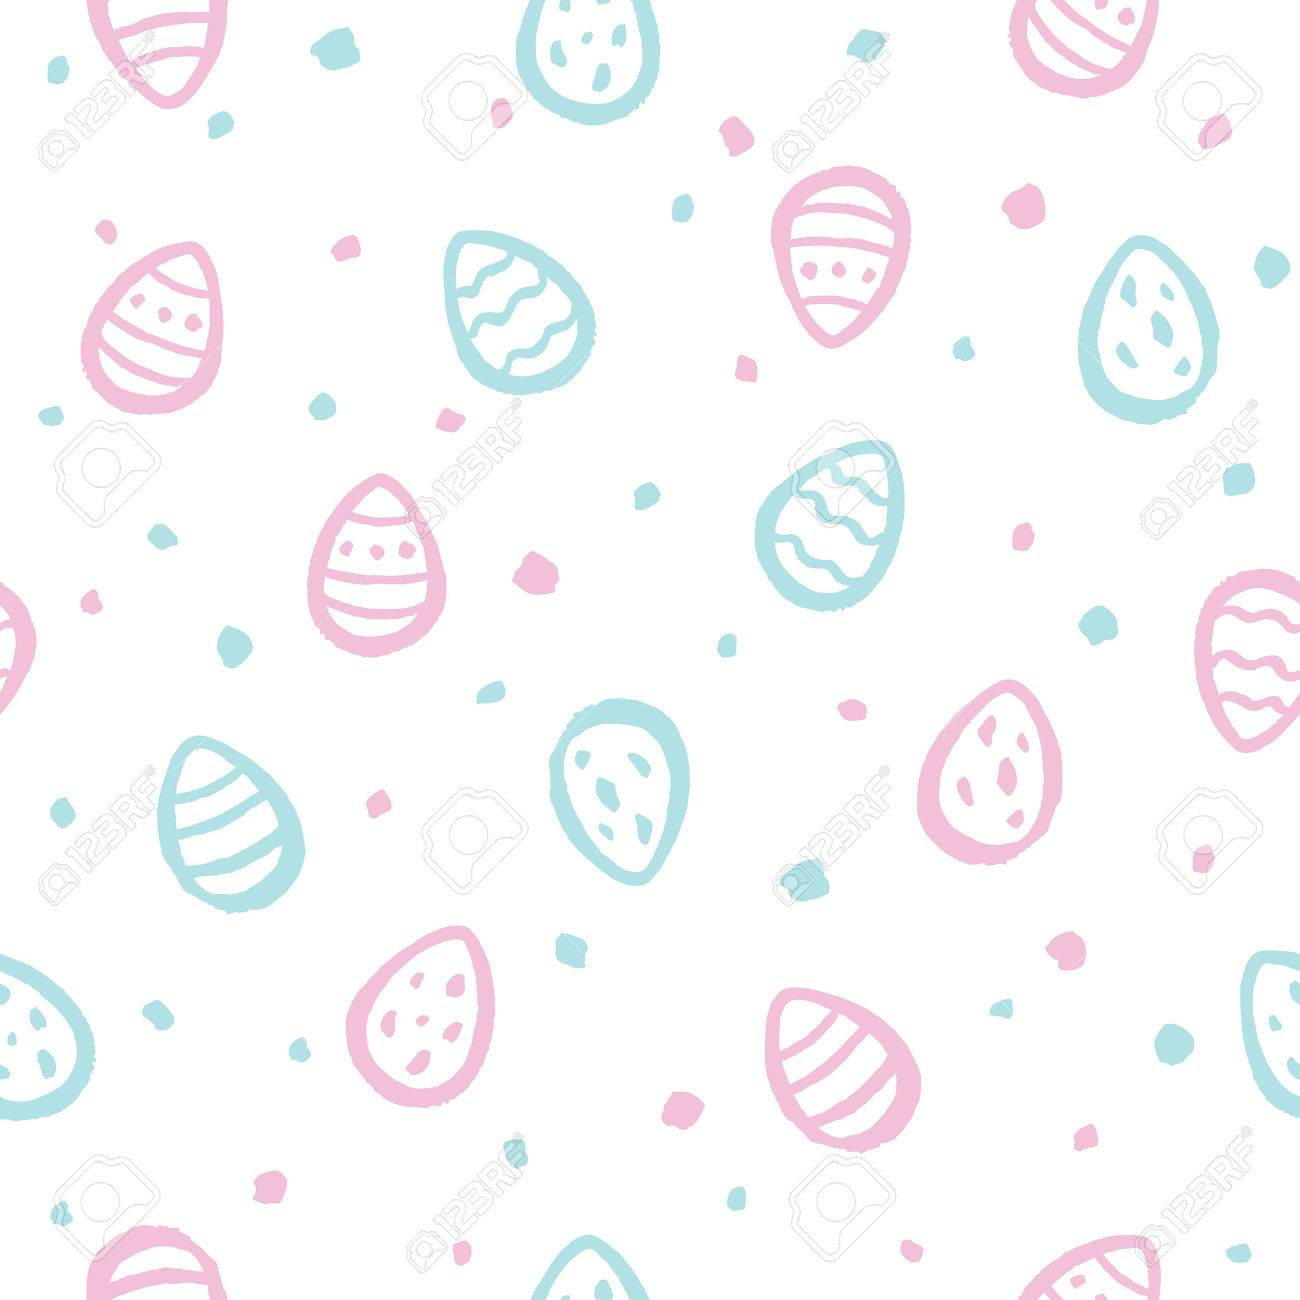 tiny brush drawn easter eggs and specks flecks spots seamless